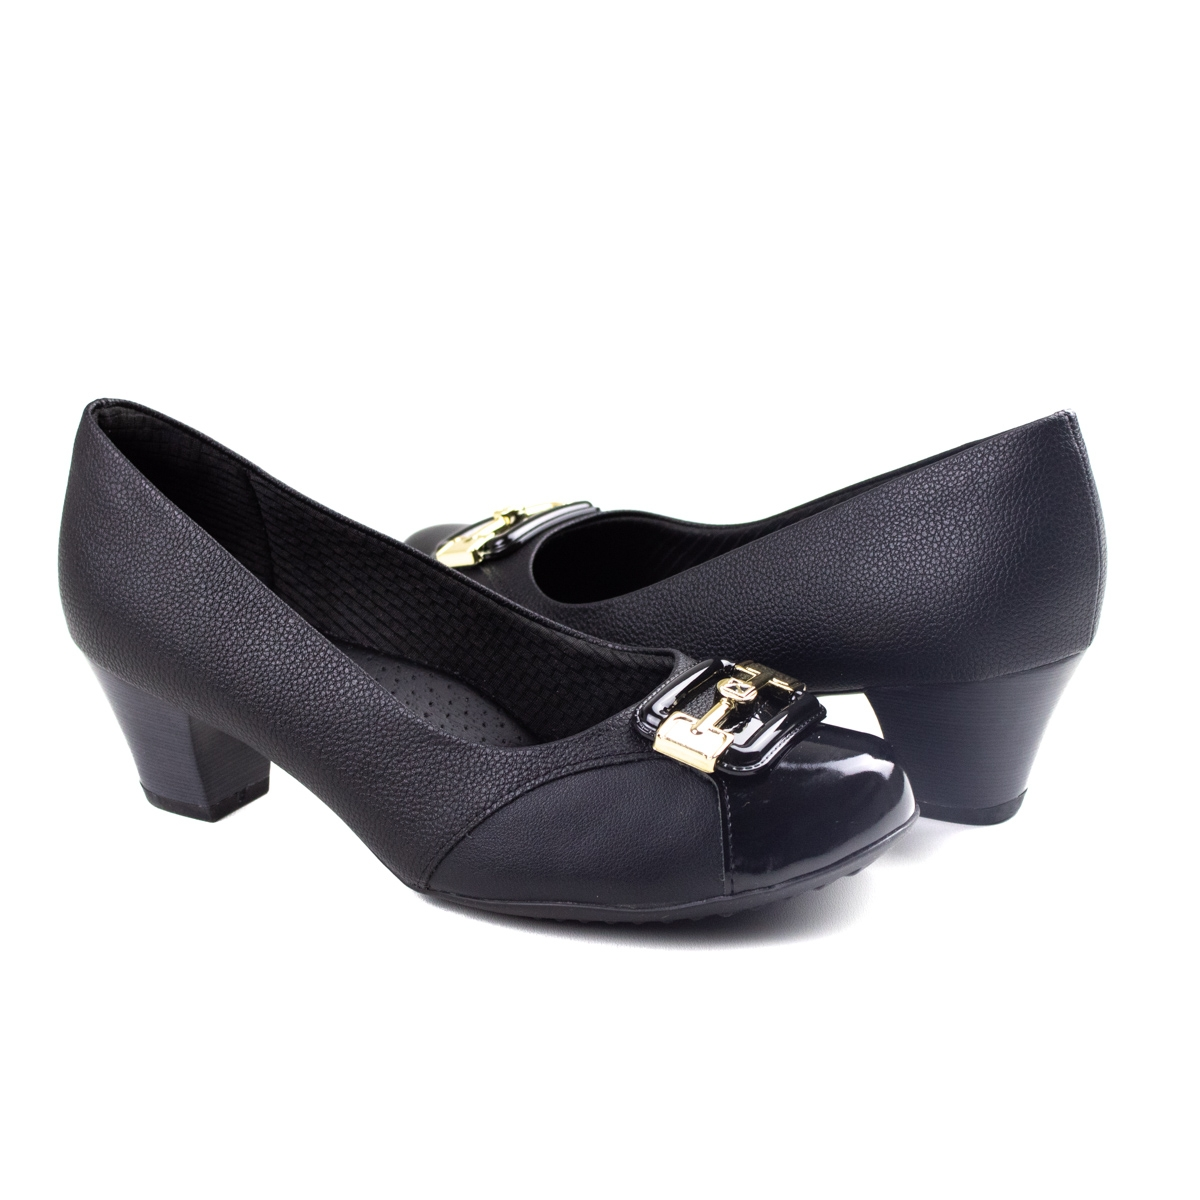 Sapato Salto Médio Feminino Piccadilly - Preto